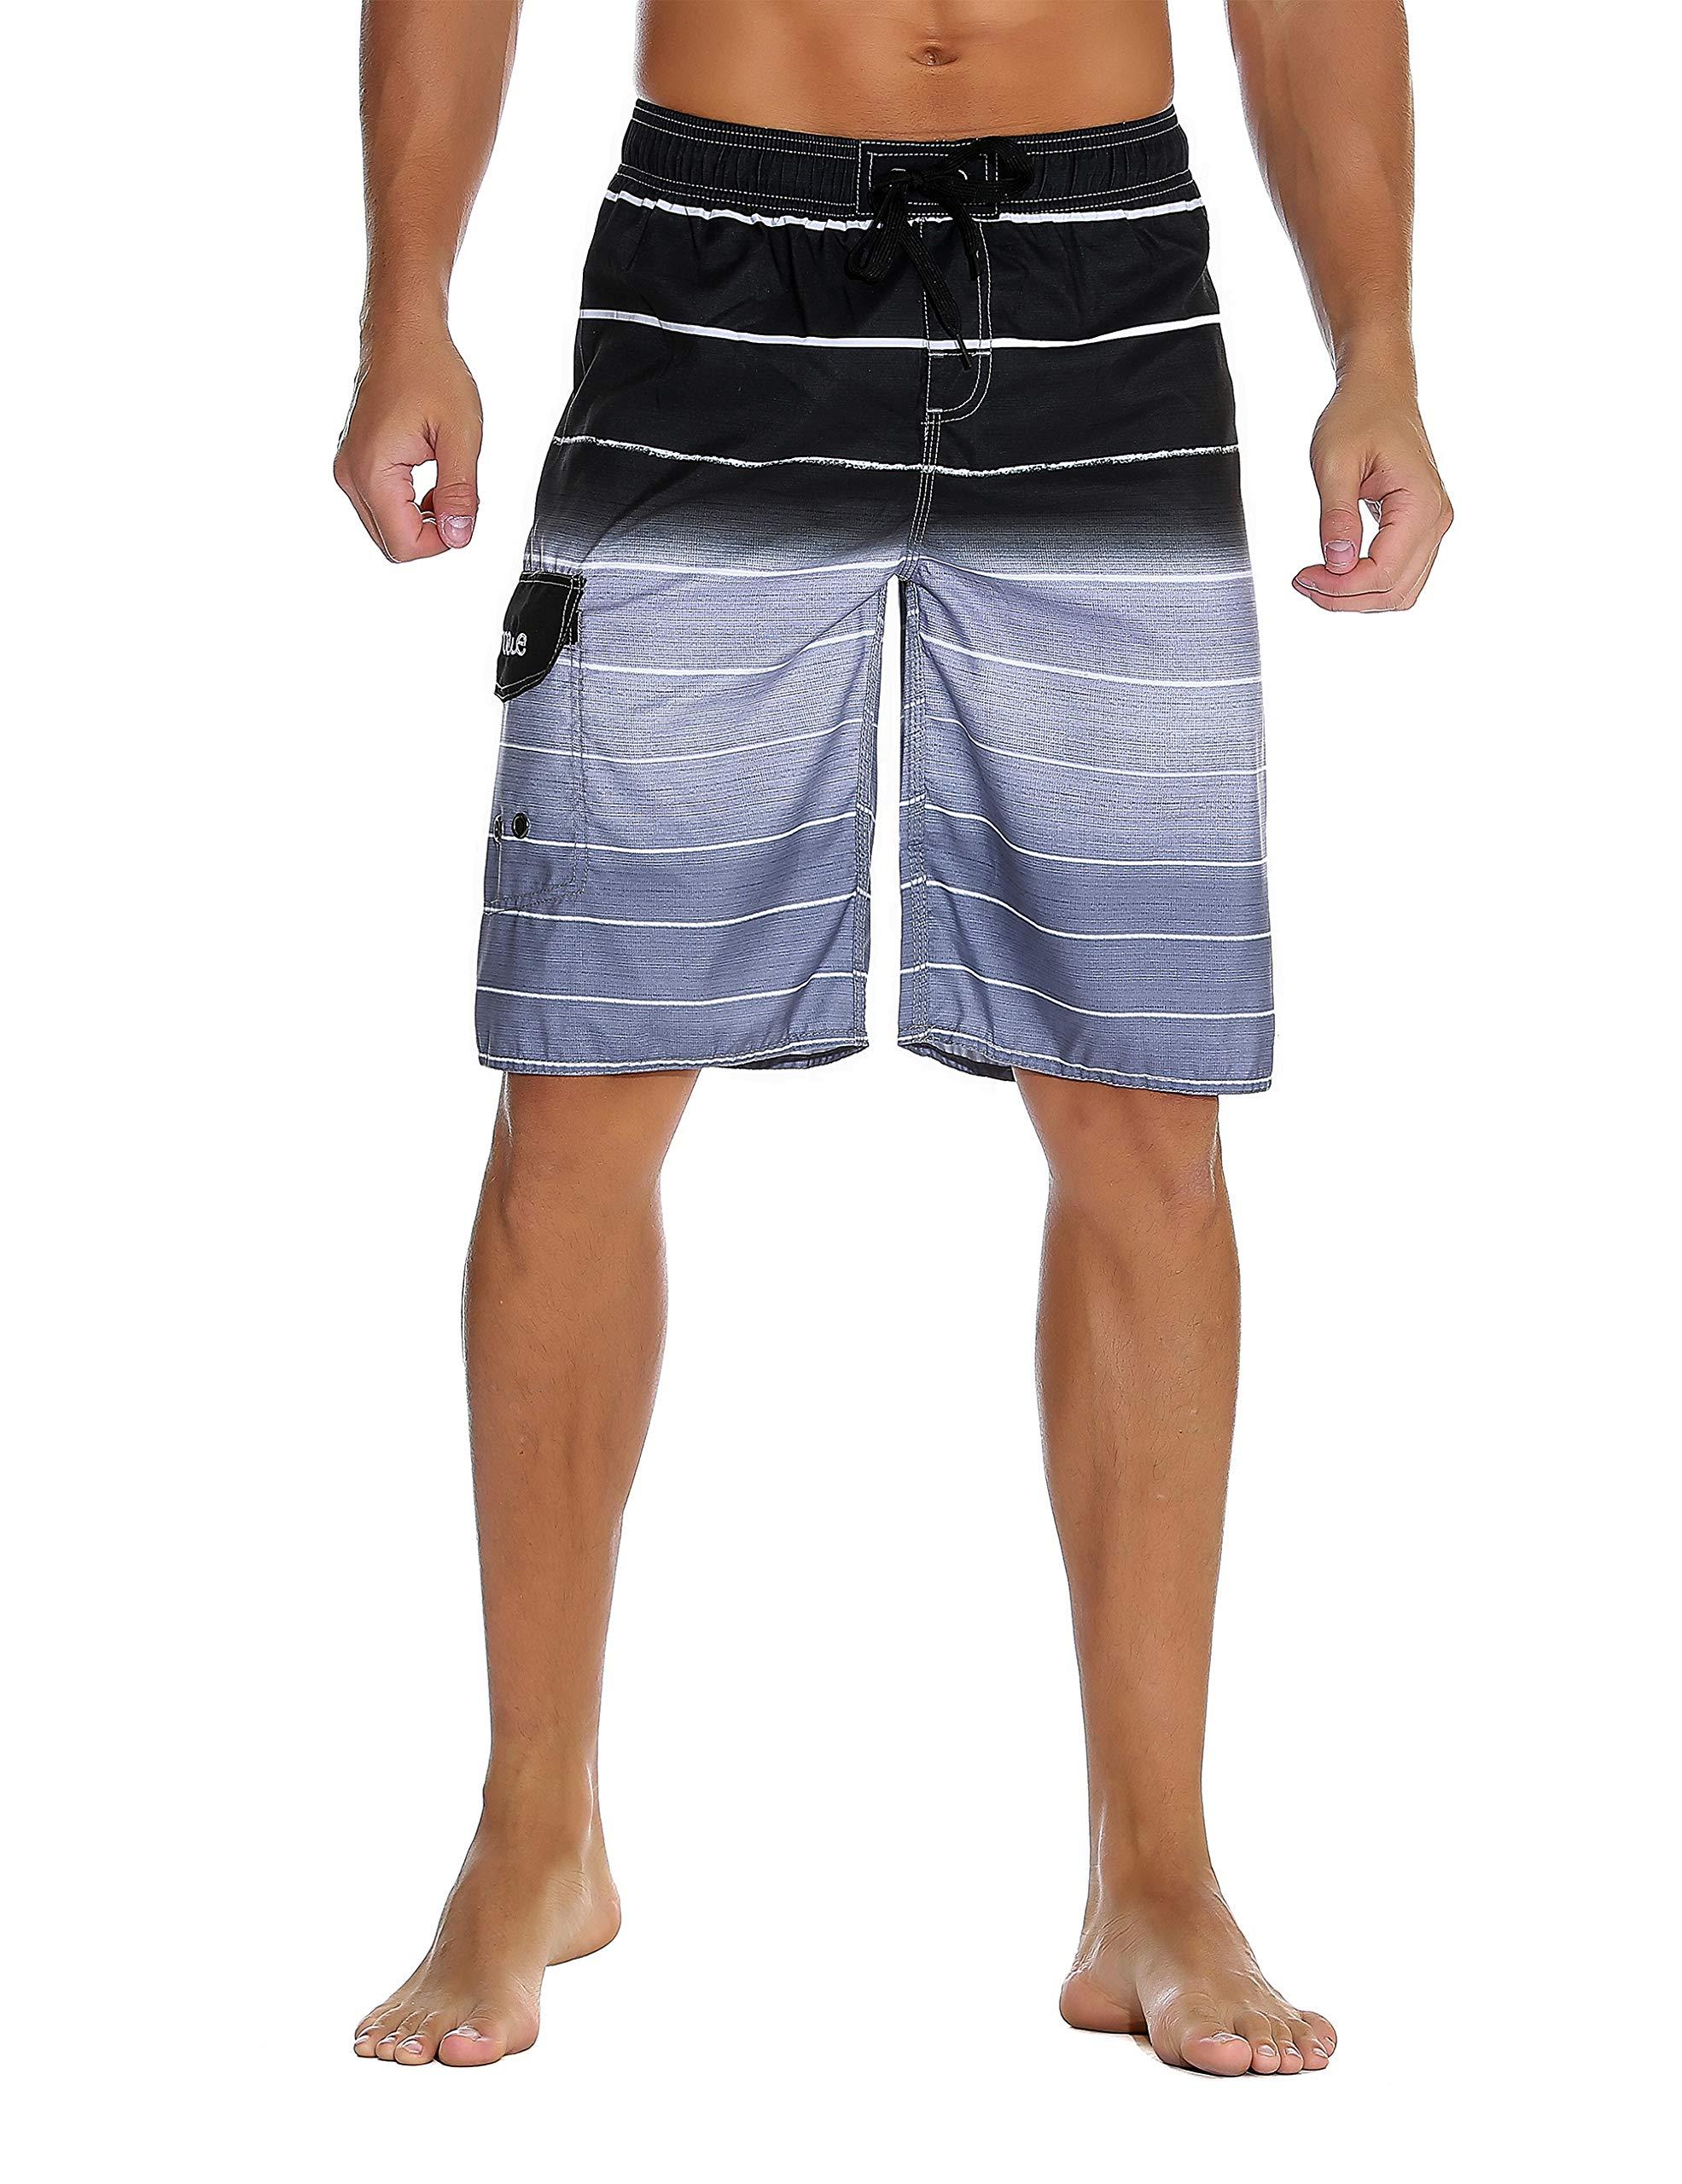 Nonwe Men's Beachwear Quick Dry Holiday Drawstring Striped Beach Shorts Gray 42 by Nonwe